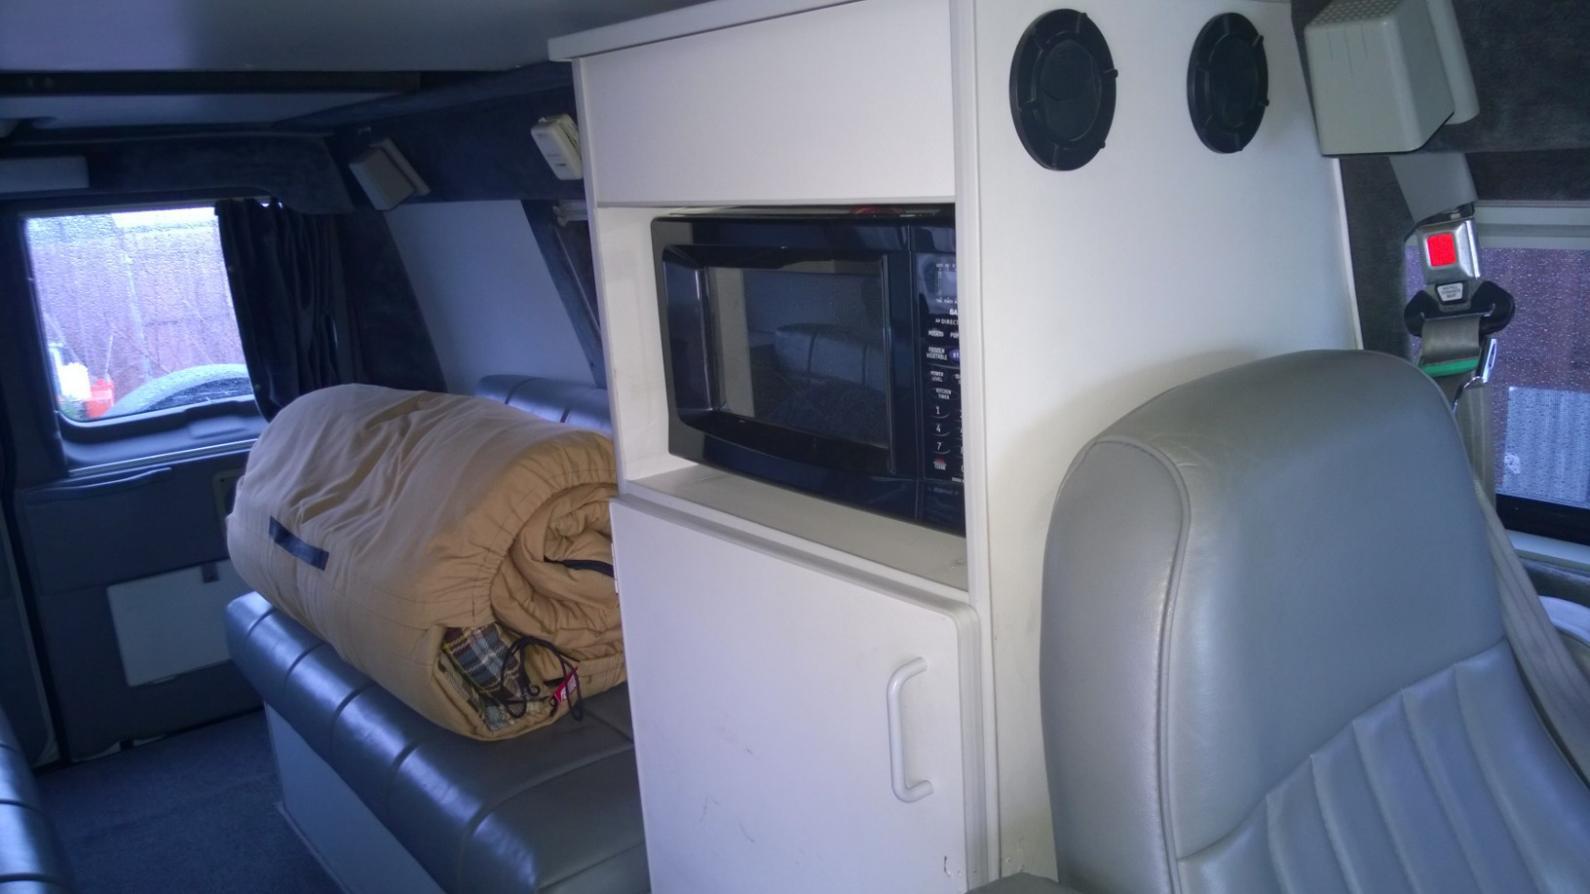 Microwave & Starcool